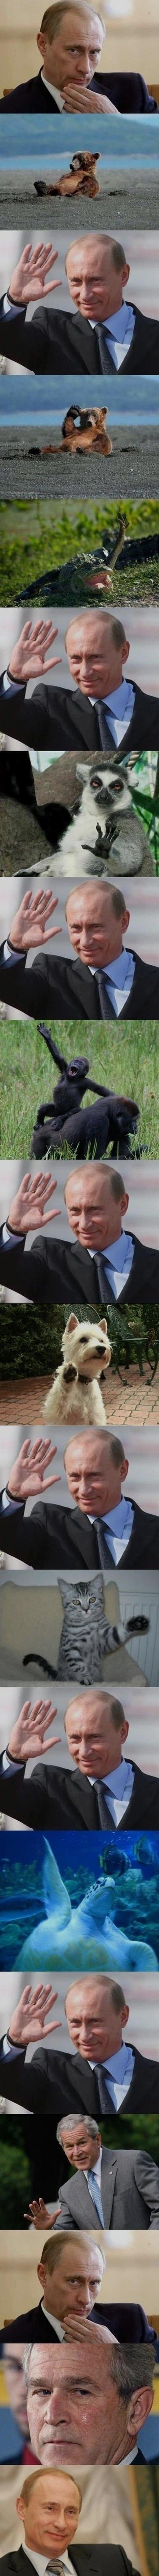 Putin  Highfive